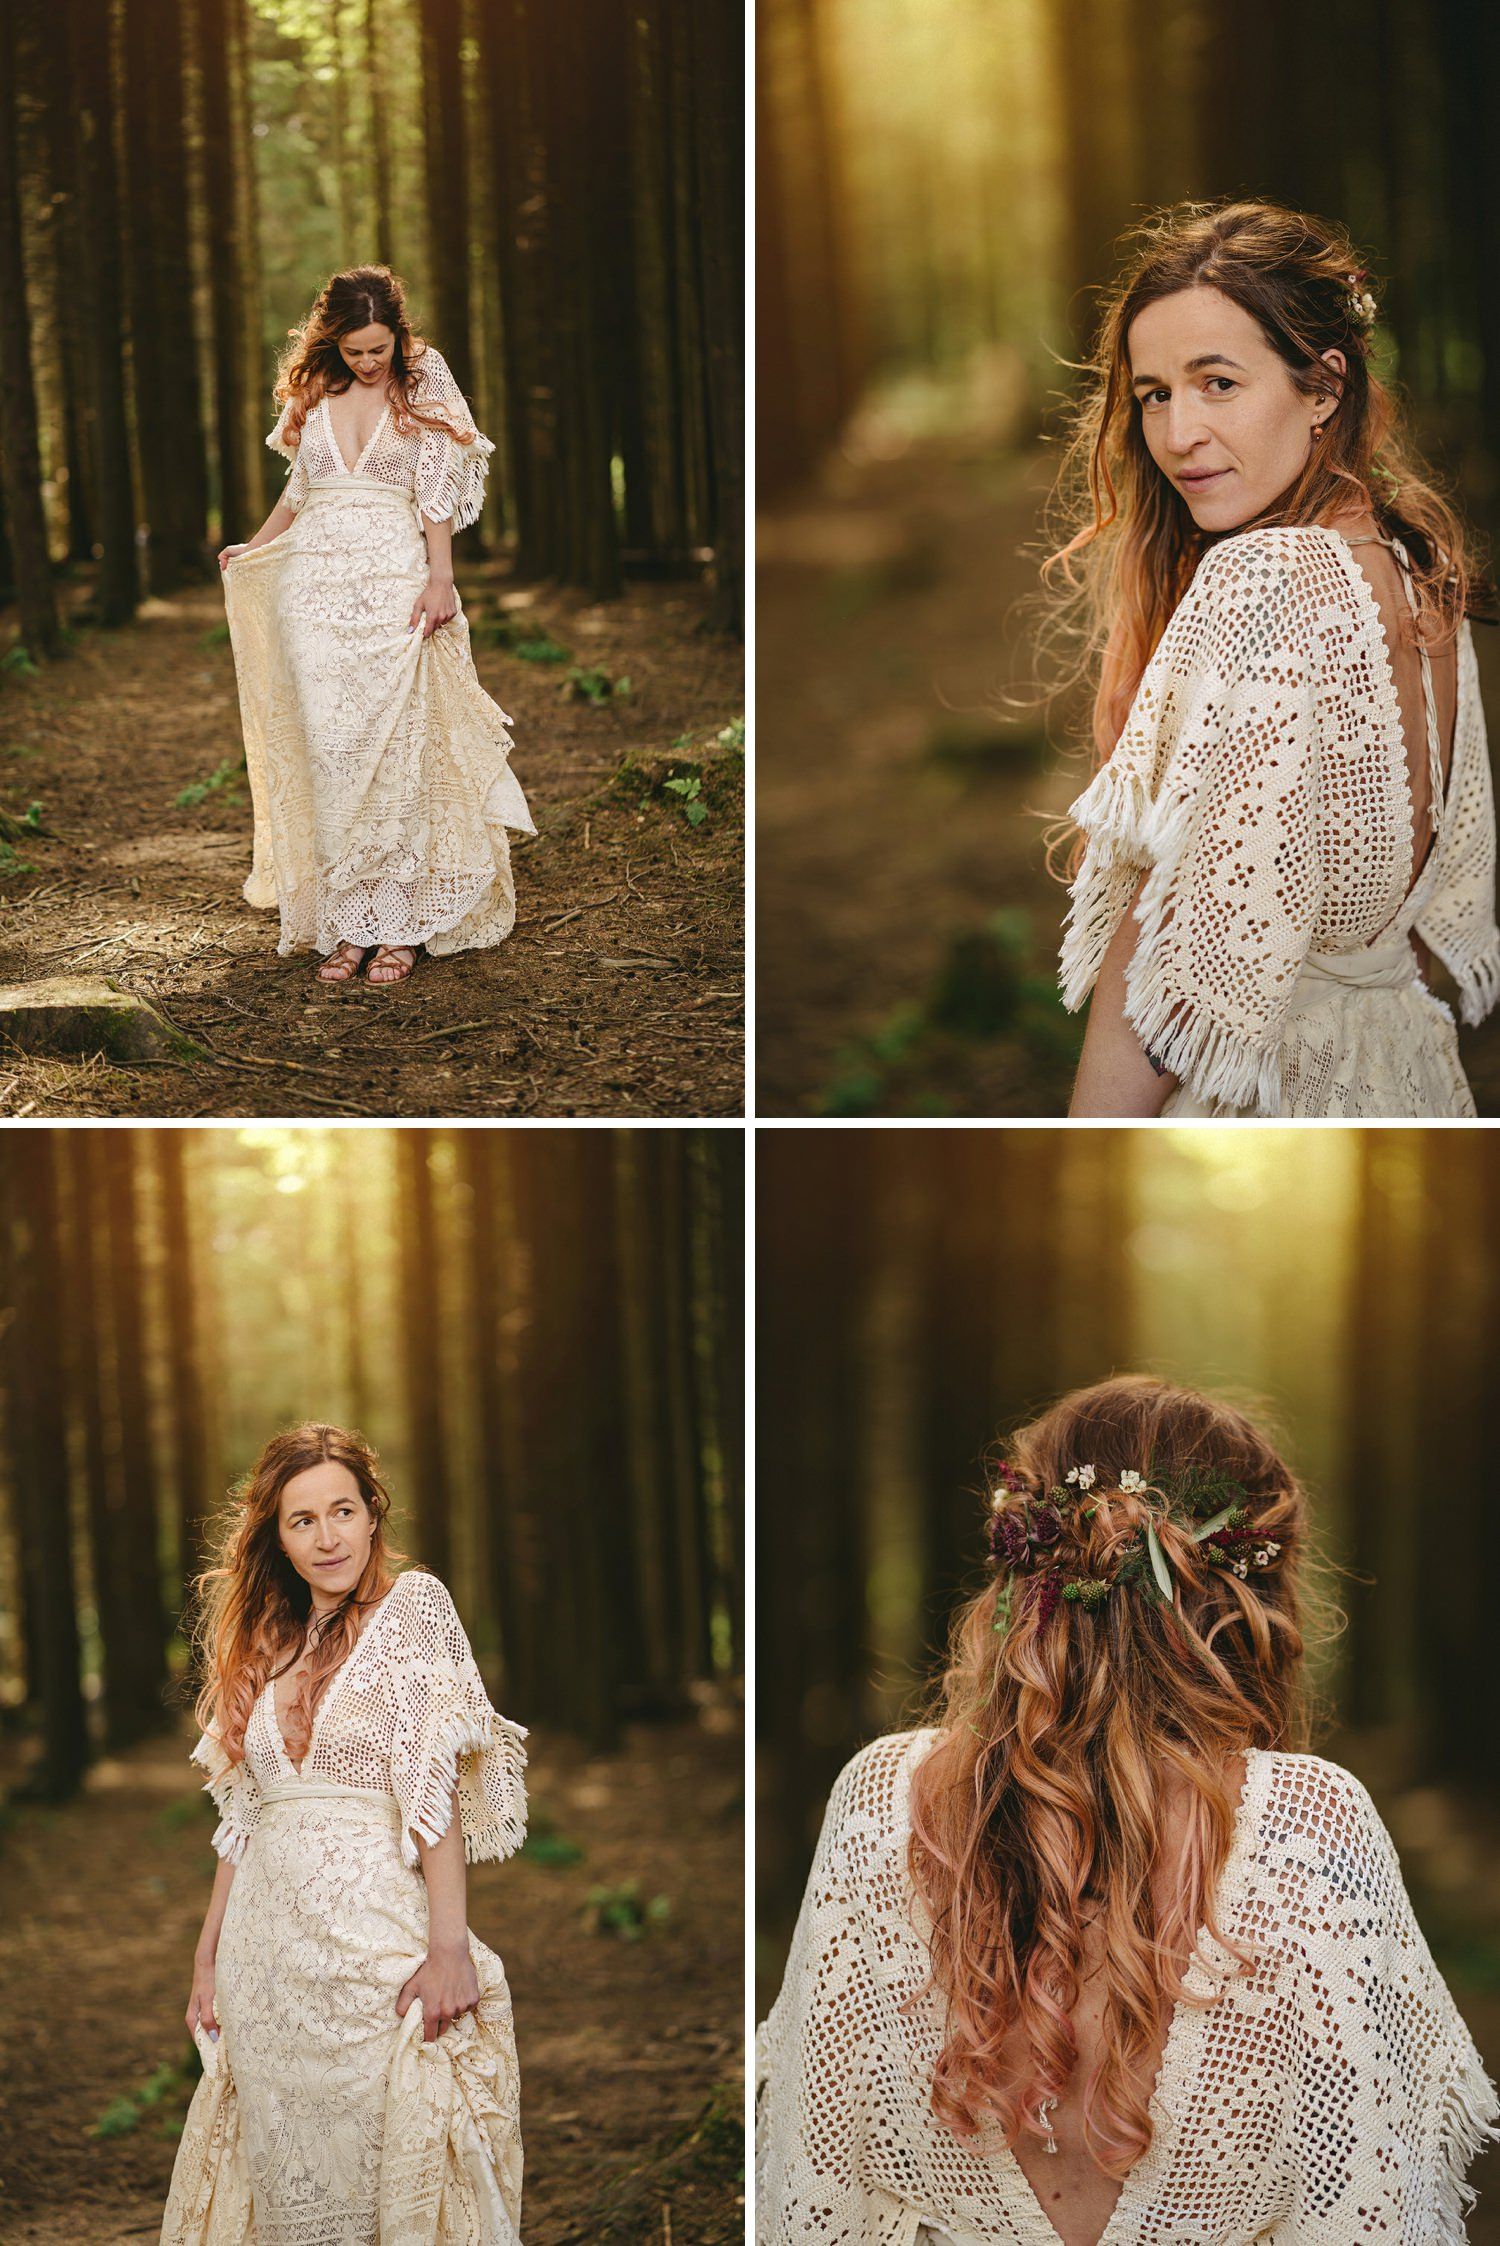 Reclamation wedding Dress design. Alternative Bride